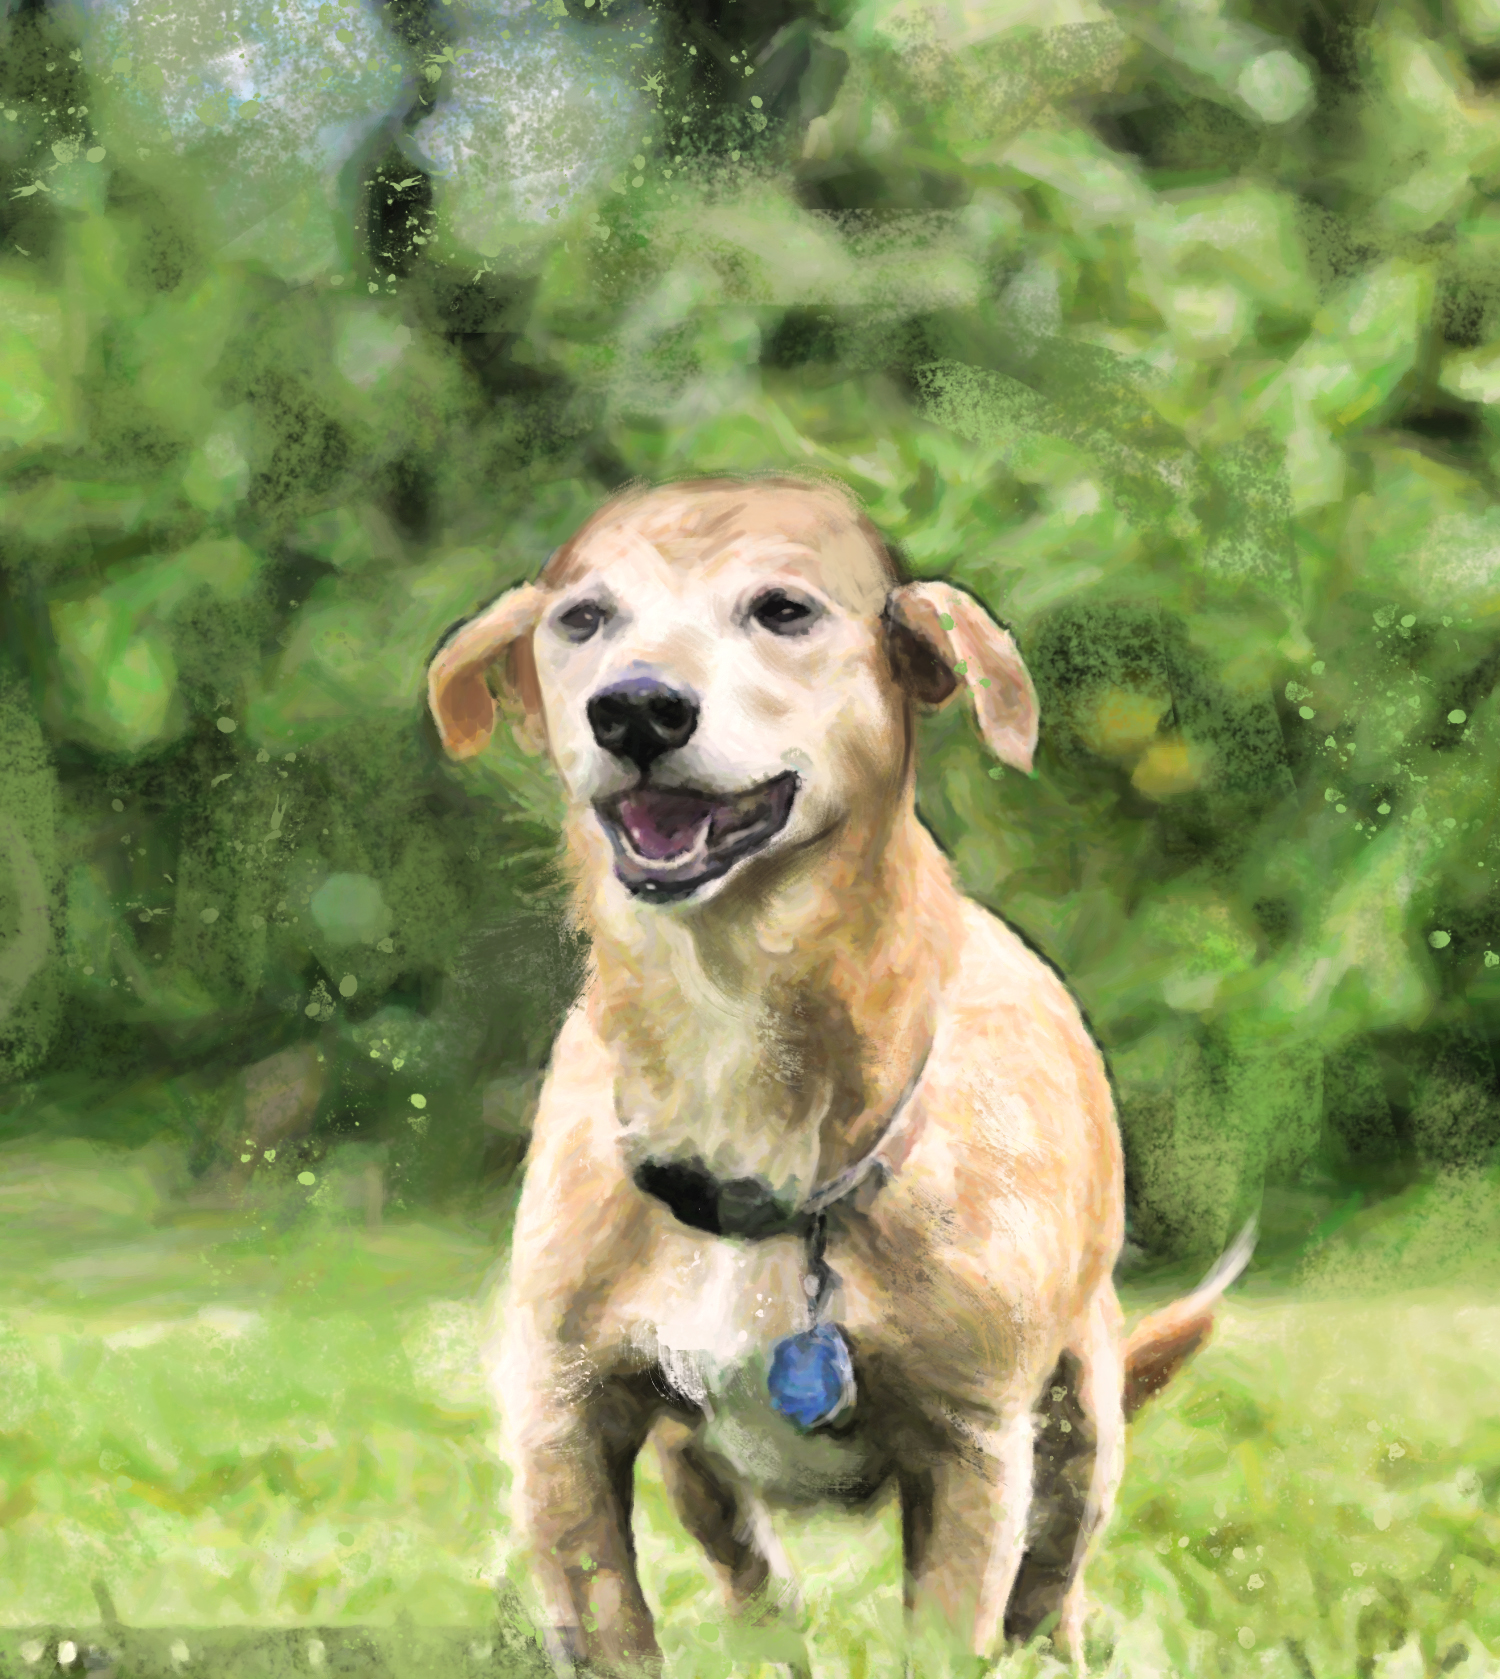 Cachorro - Max - foto por Barry Bland_Barcroft Media 02 icaro